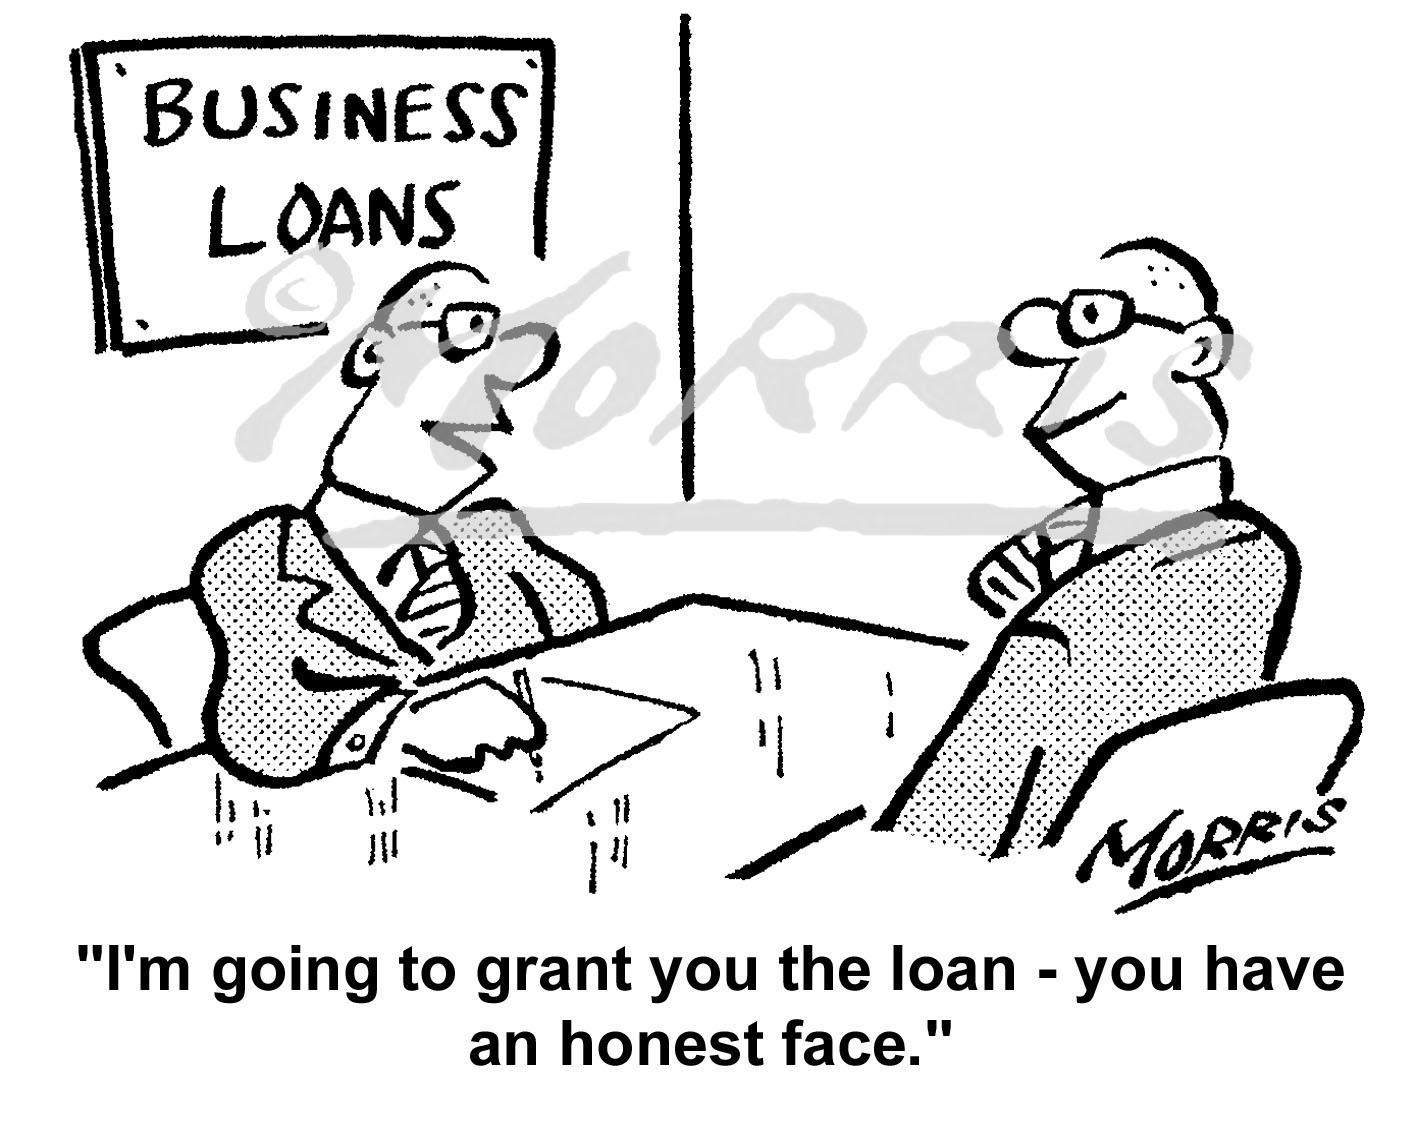 Business loans comic cartoon – Ref: 5327bw